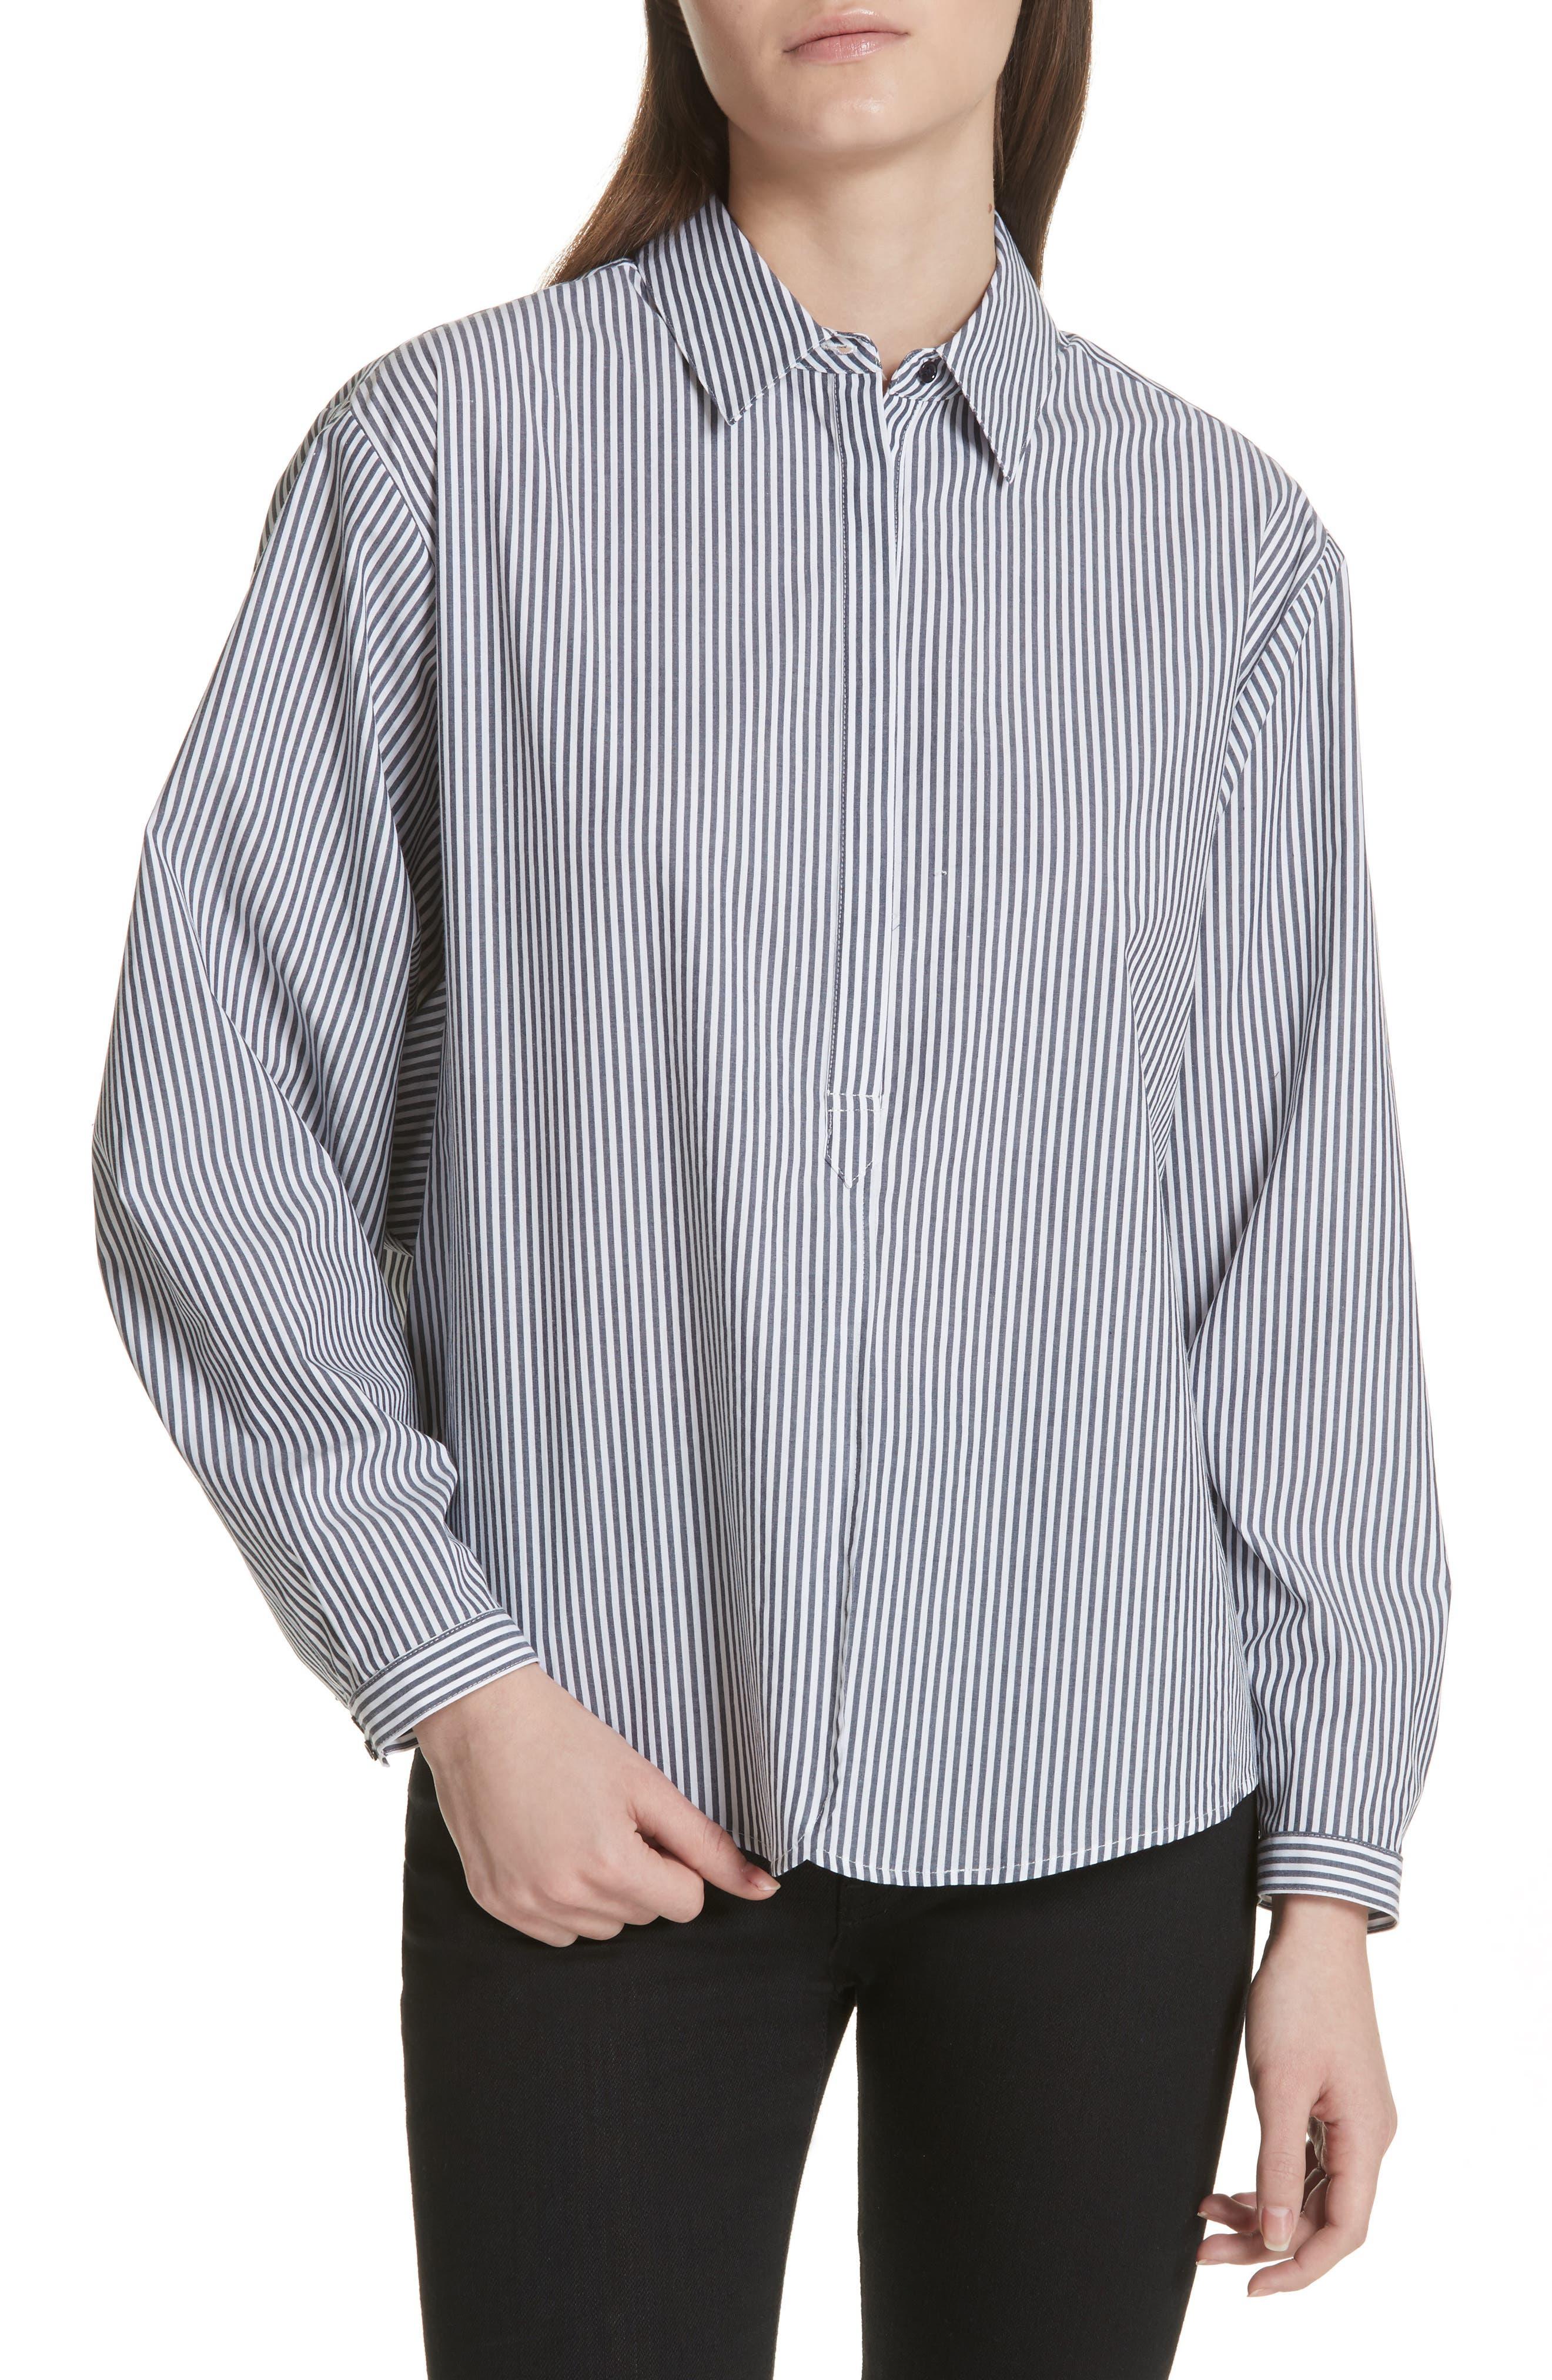 Anjanique Spread Collar Top,                         Main,                         color, 418